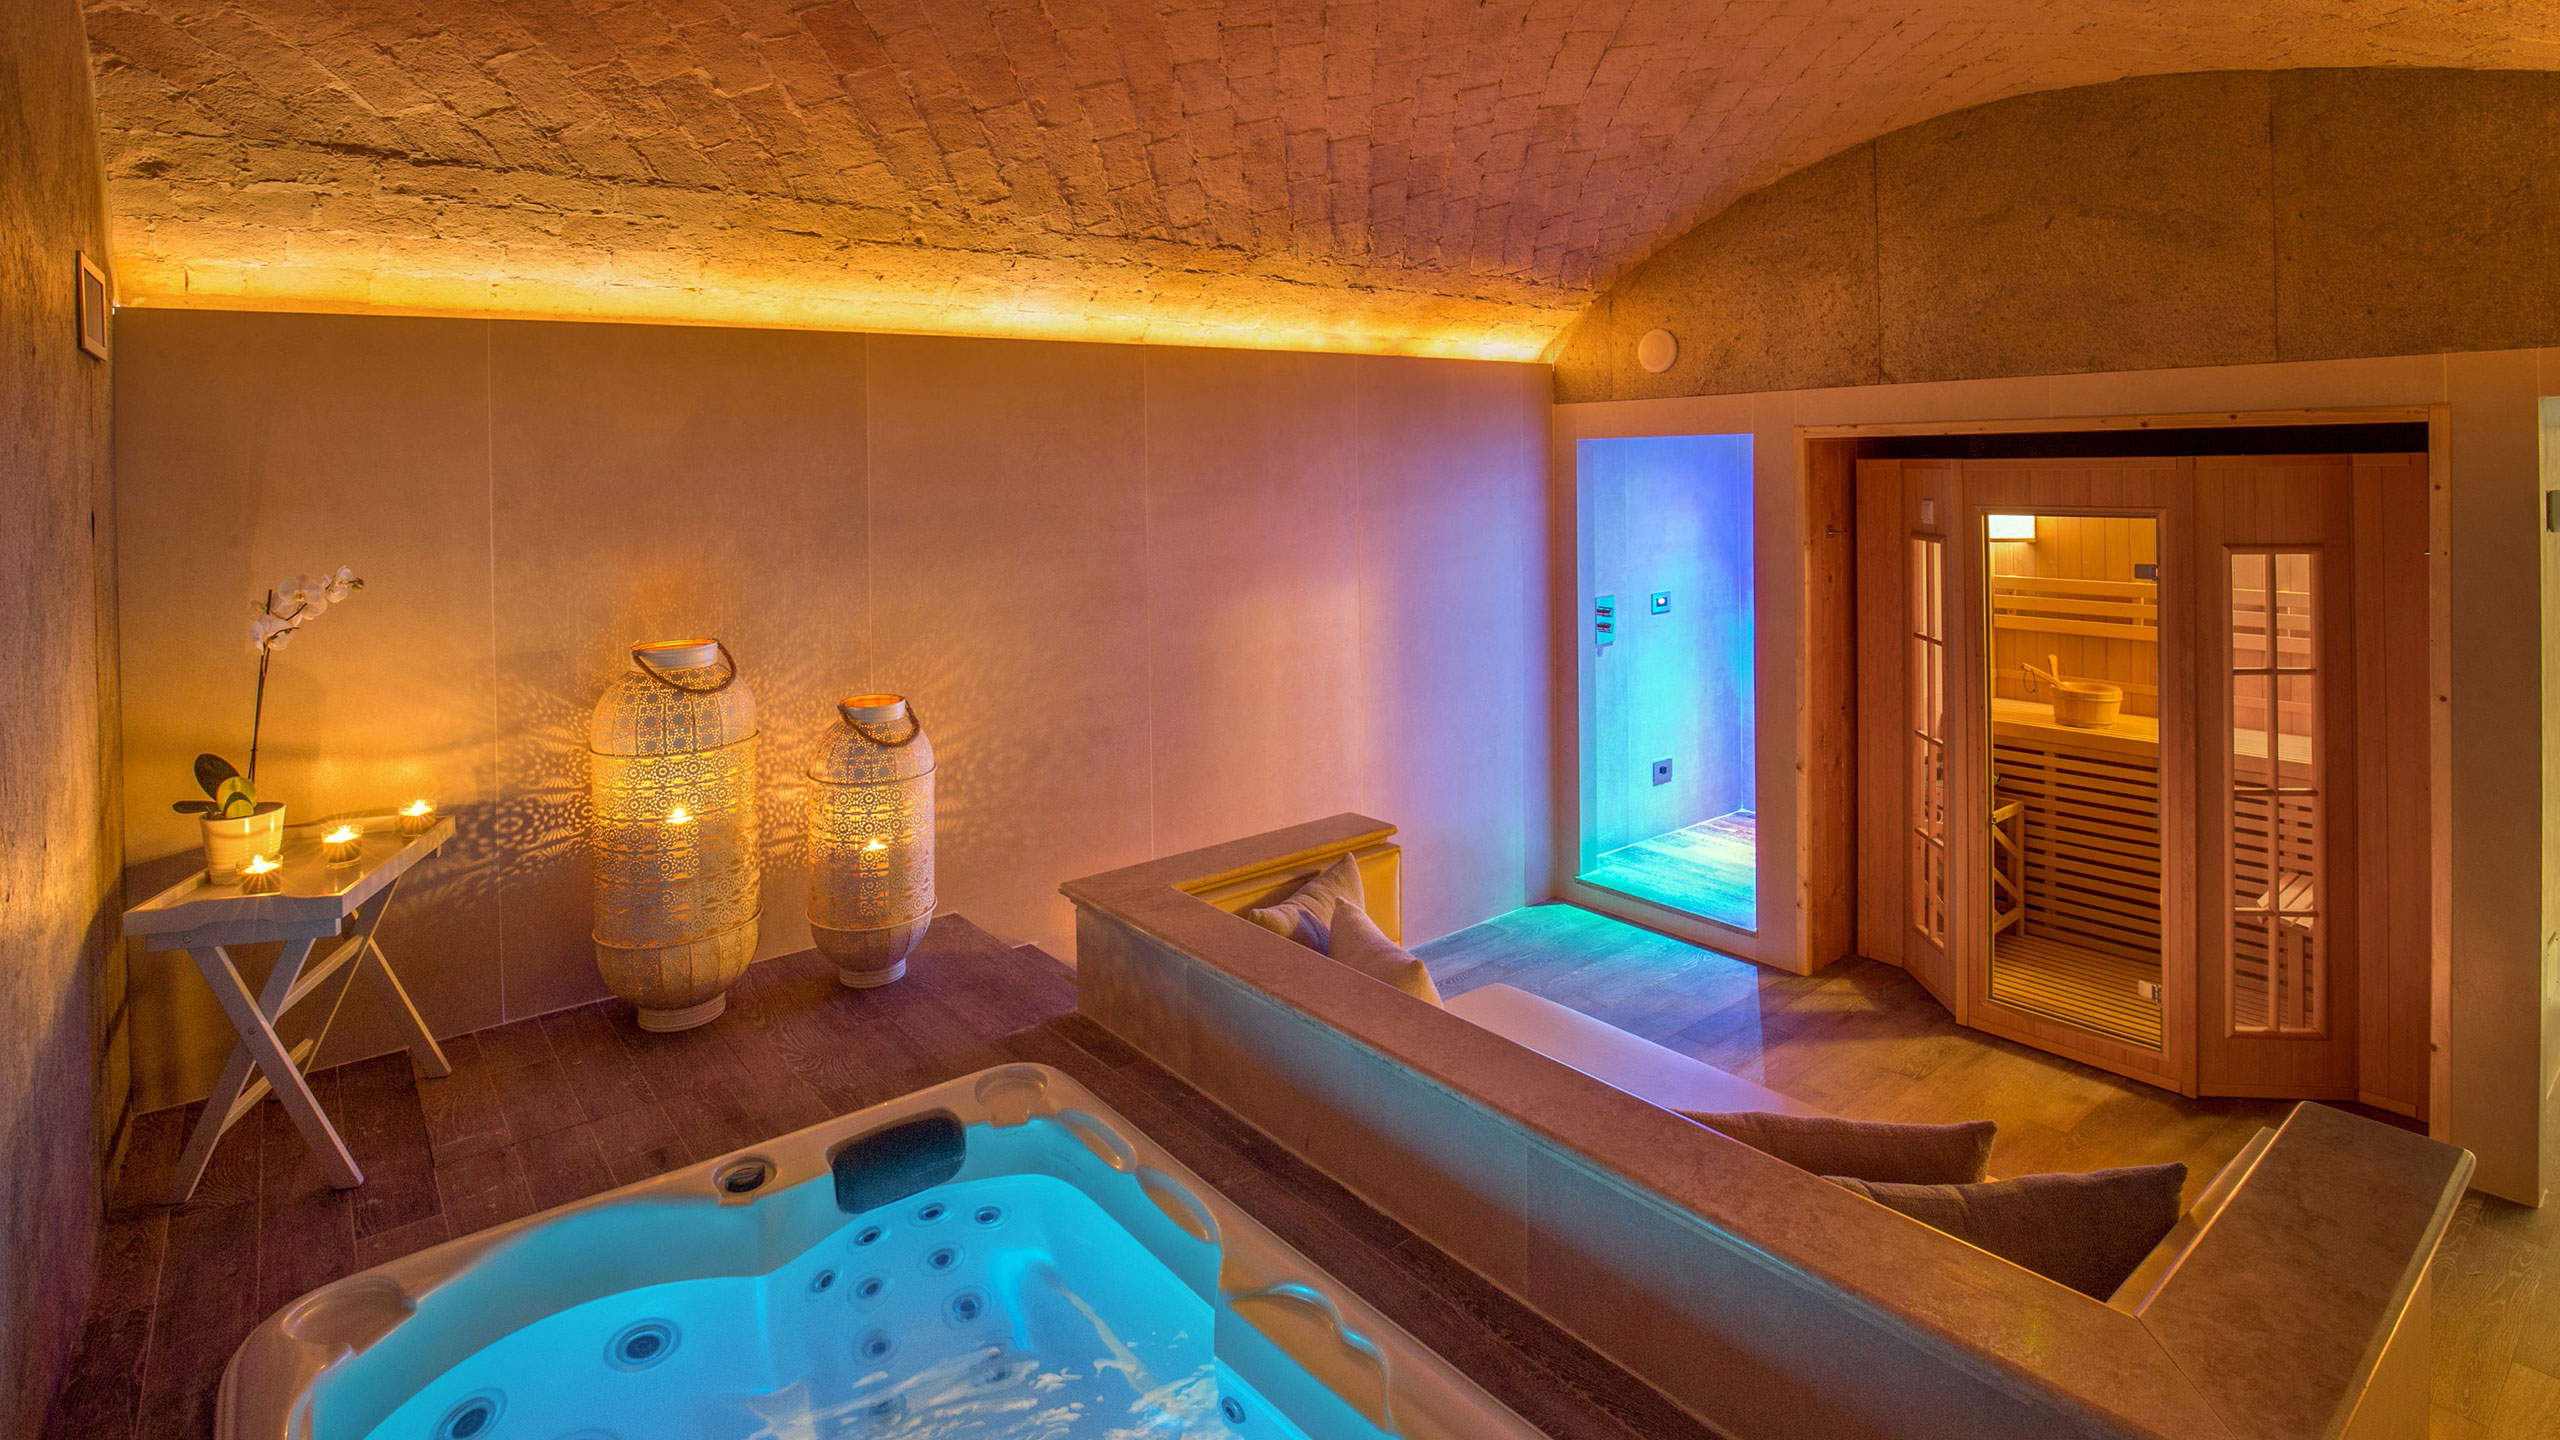 Piccolo-borgo-spa-7519nn-slide.jpg